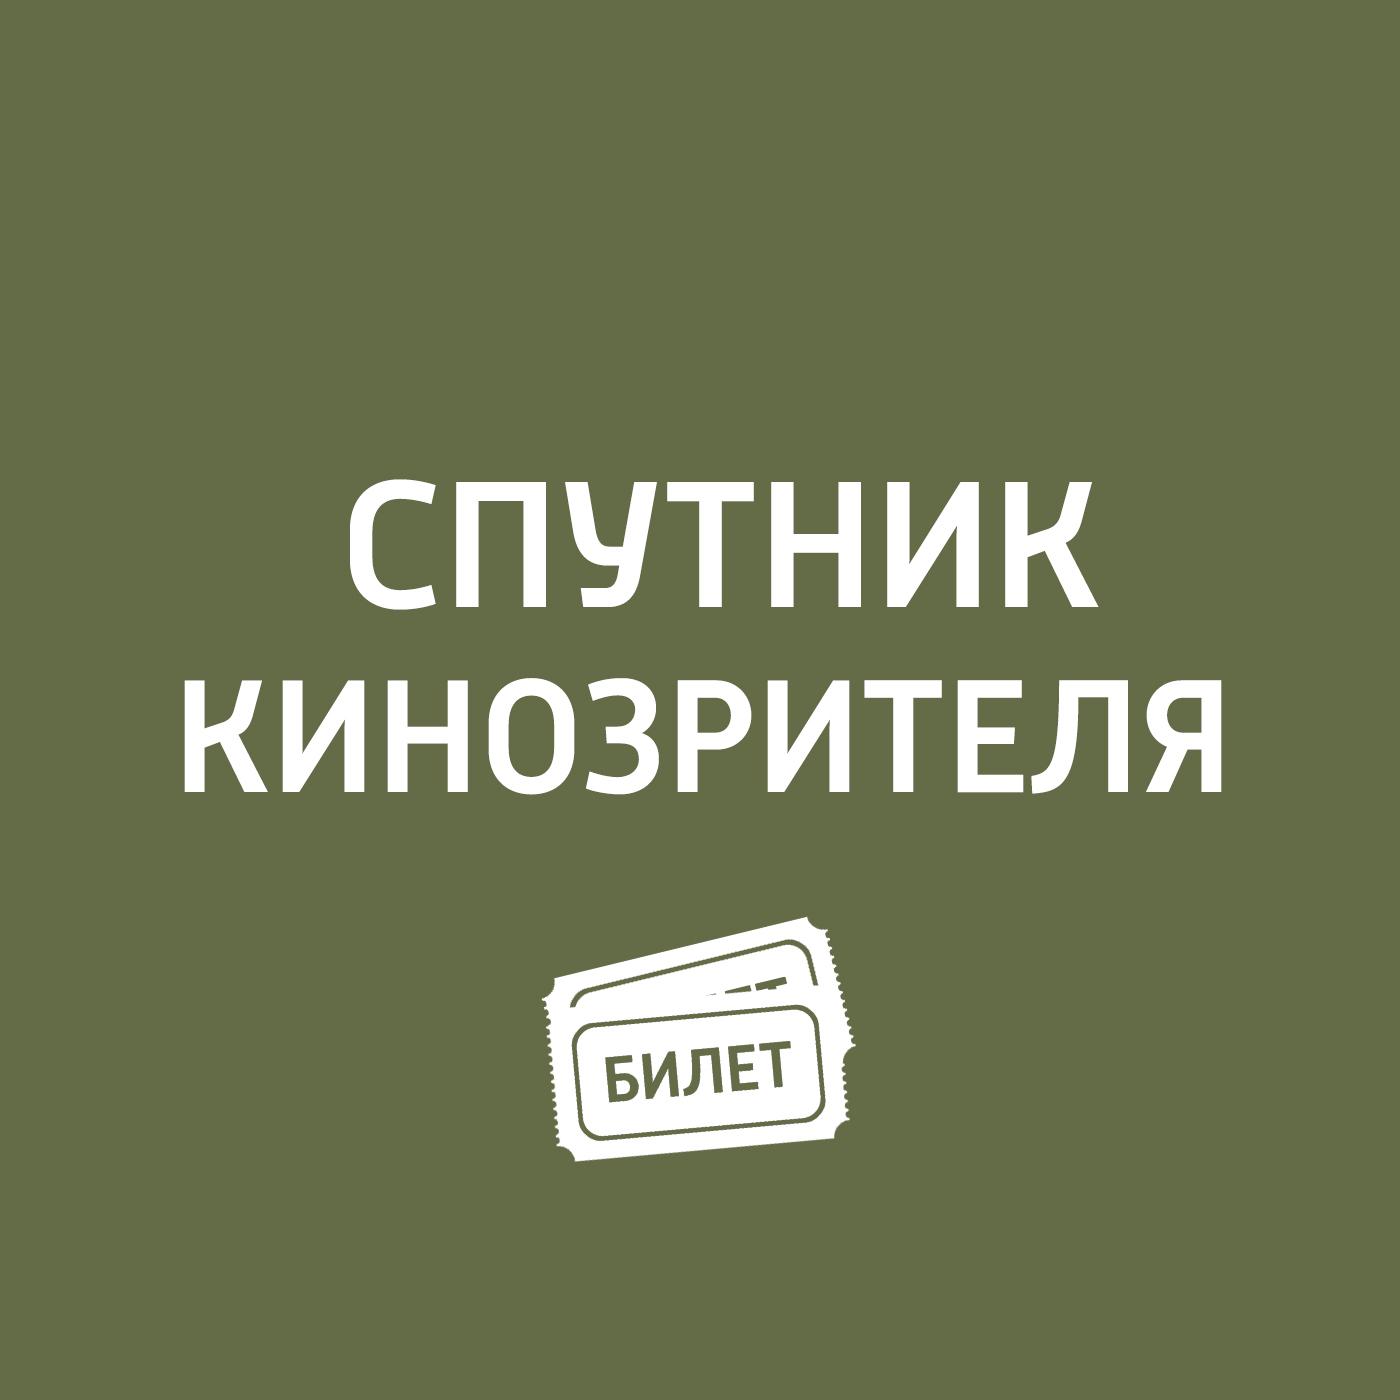 Антон Долин Неудержимые-3, «Красотки Парижа антон долин неудержимые 3 красотки парижа